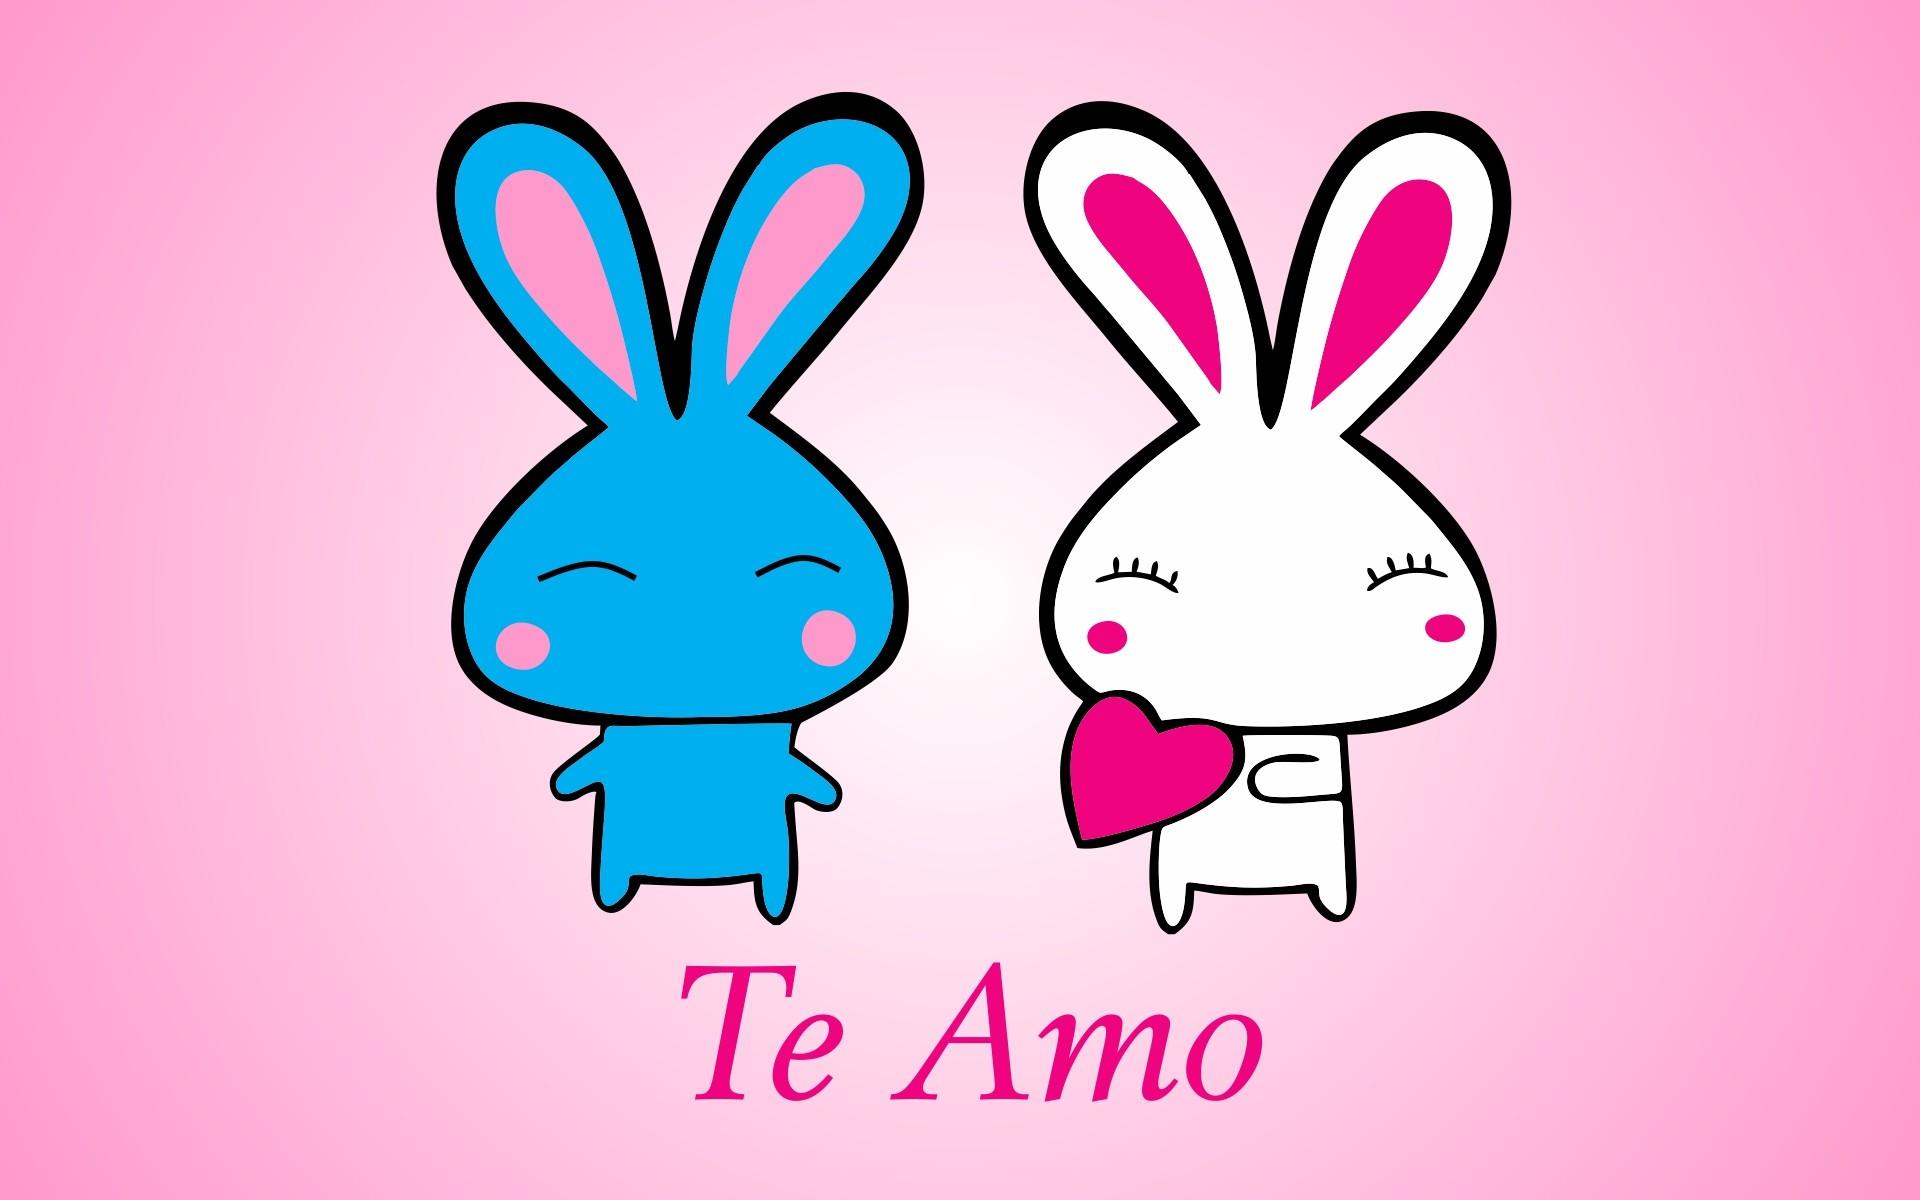 Imagens De Te Amo Para Namorado: Te Amo Wallpapers (71+ Images